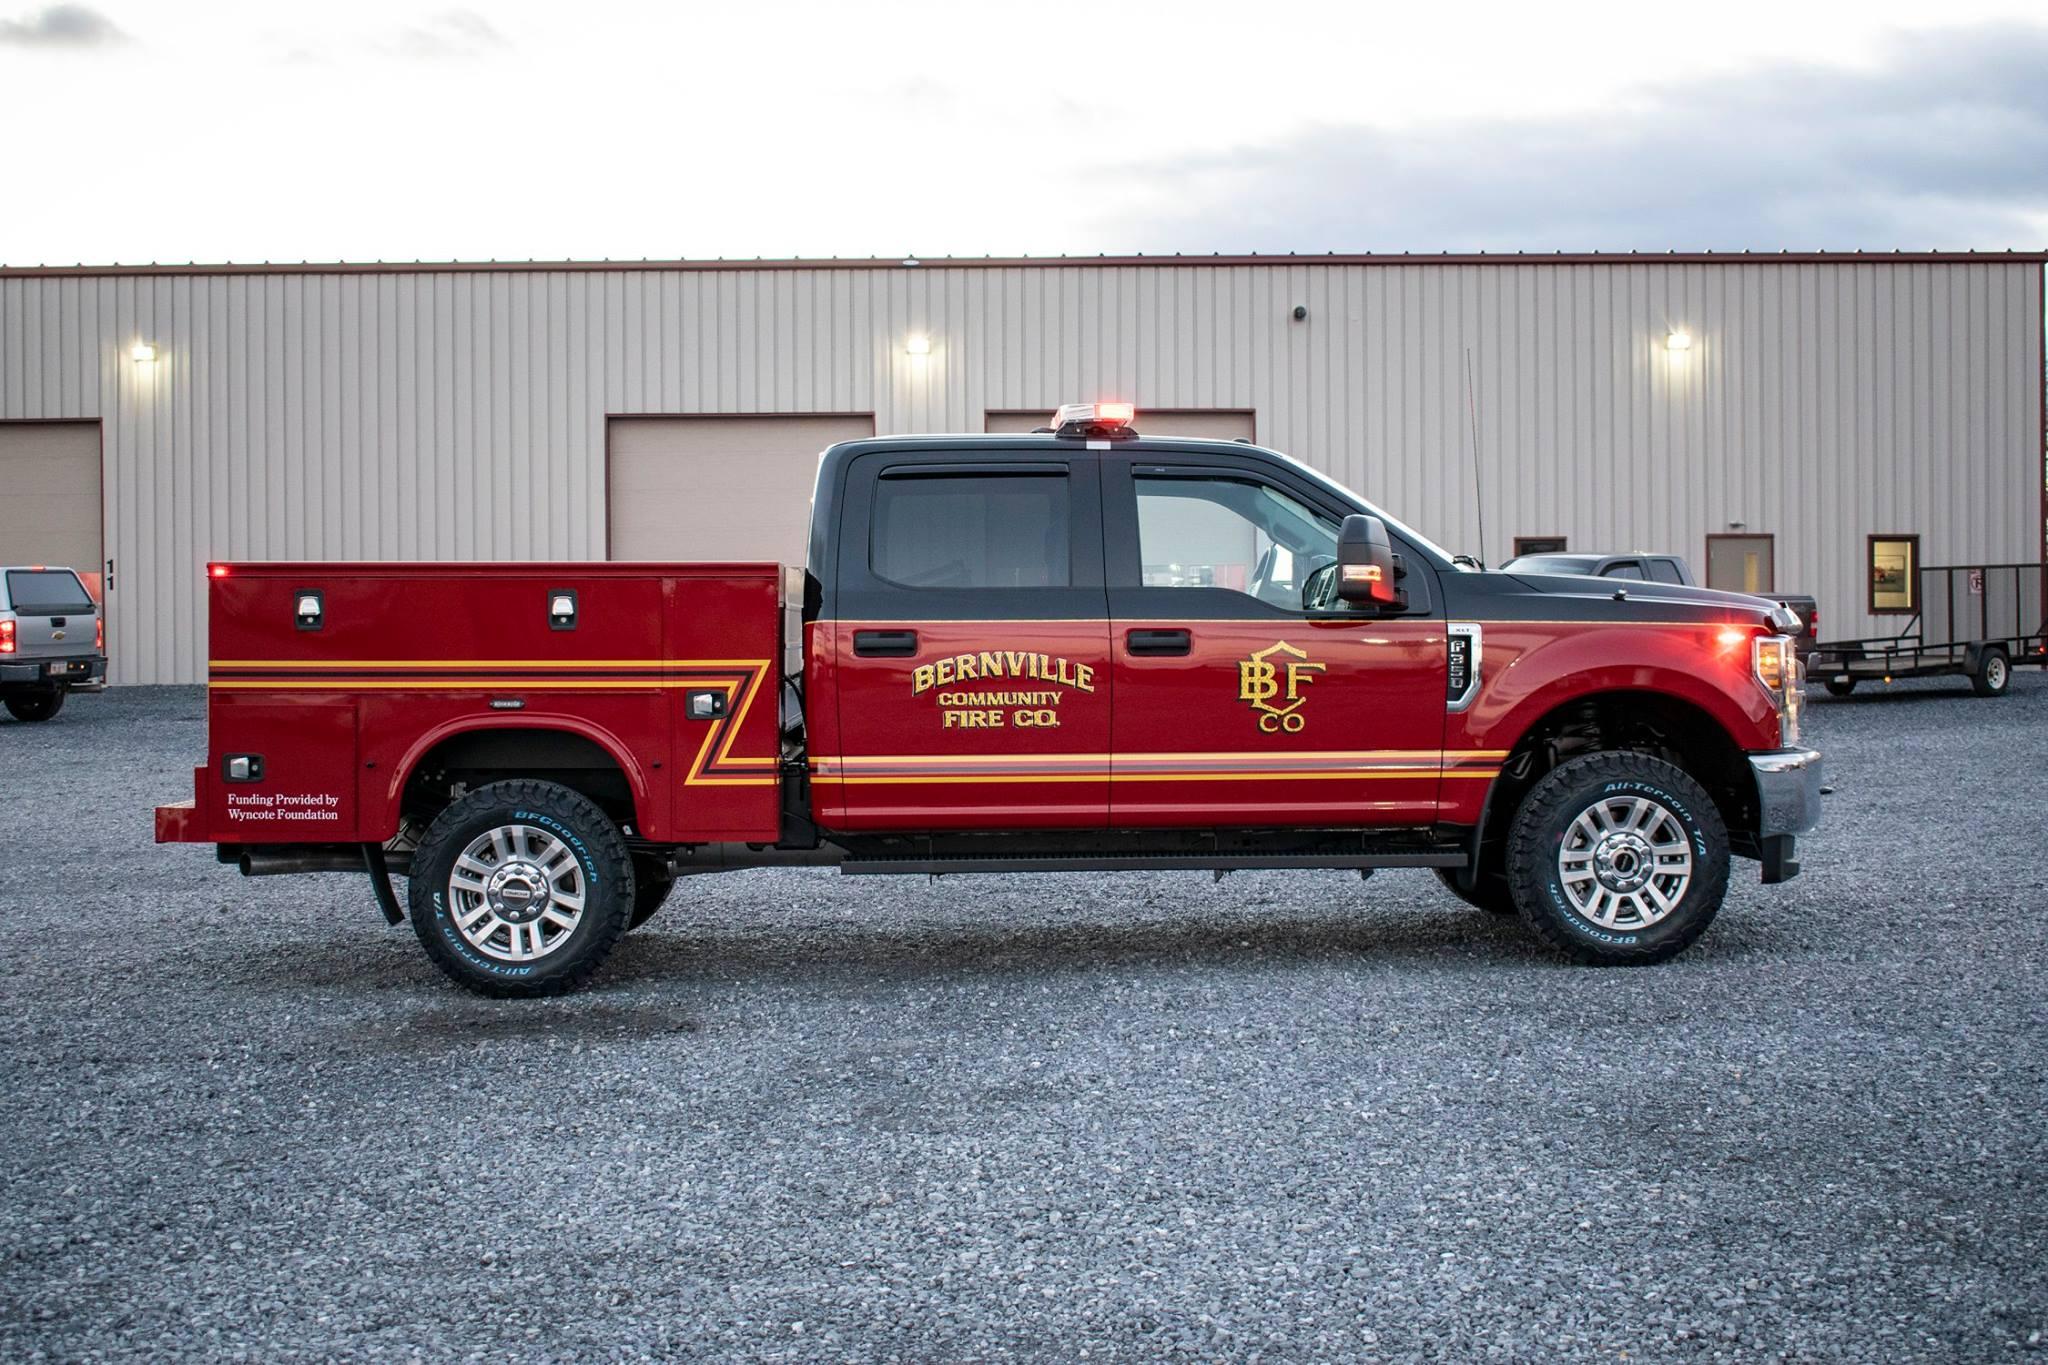 red bernville community fire co. fire truck